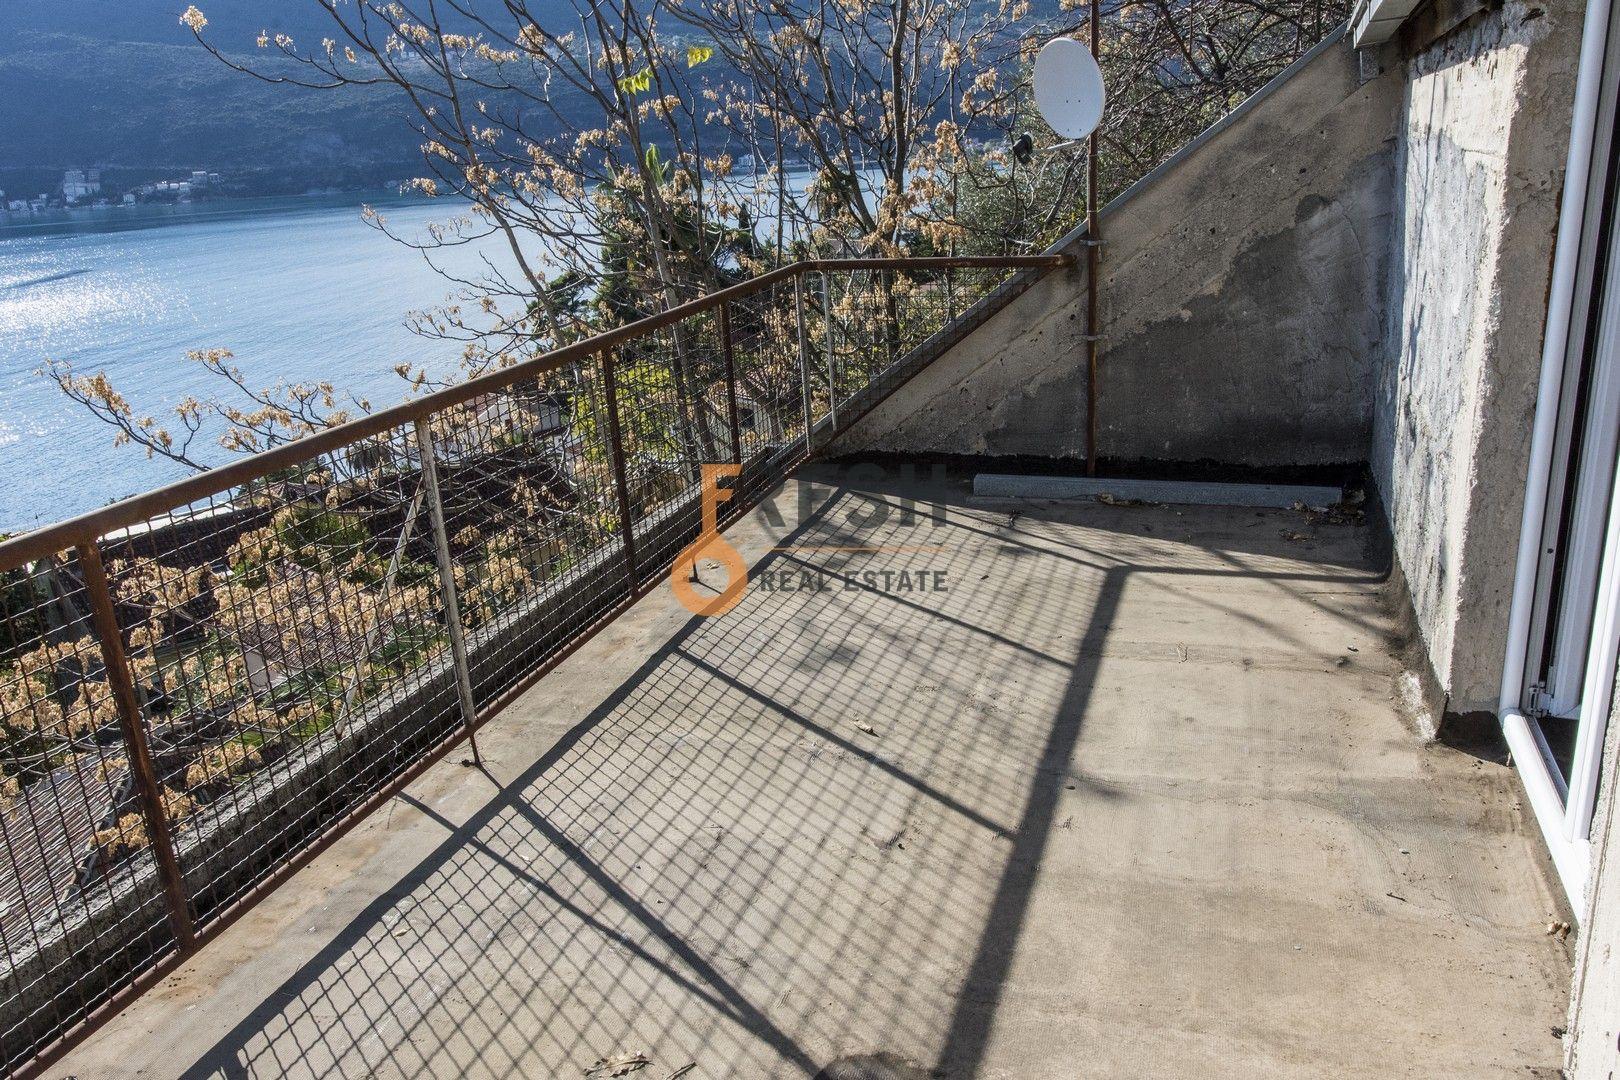 Kuca s pogledom na more i svojim dvoristem i bastom, 178 m2, Centar, Herceg Novi, prodaja - 10